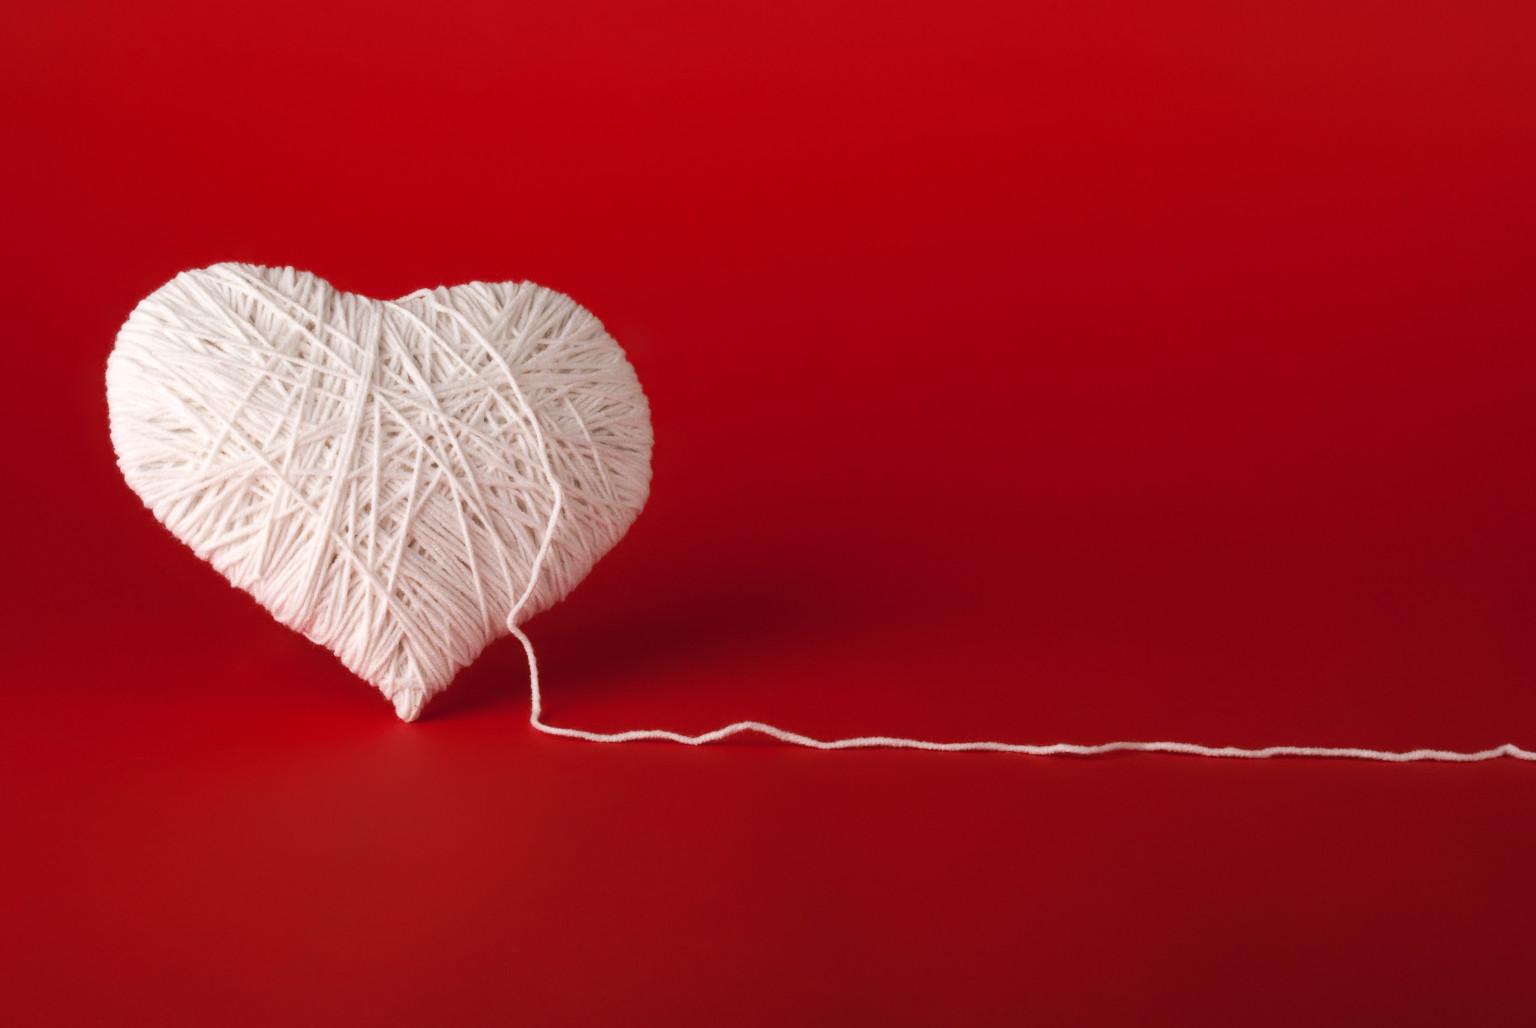 ghazal heartbreak moment